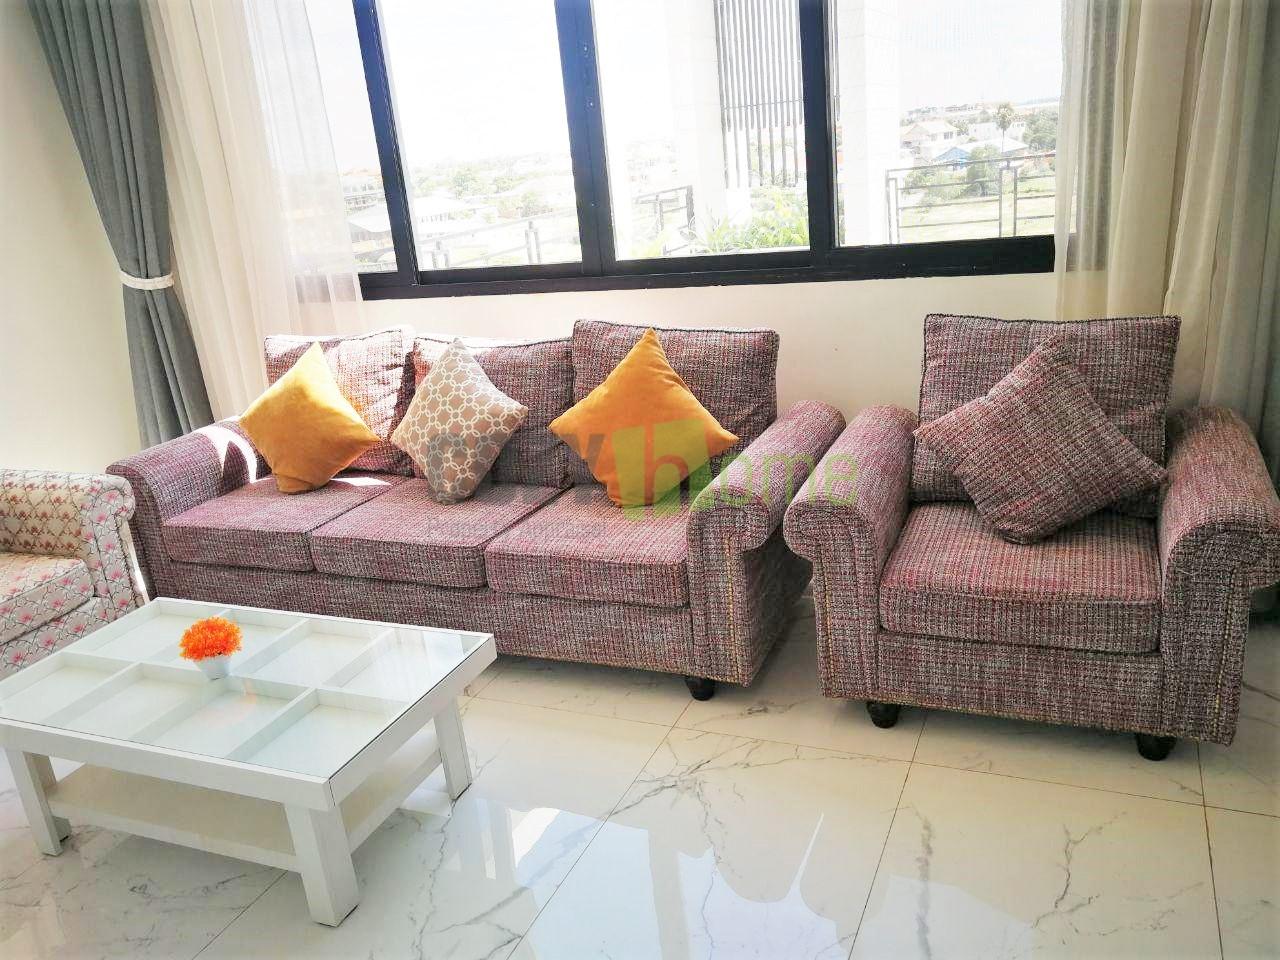 3-BEDROOM APT $900/month